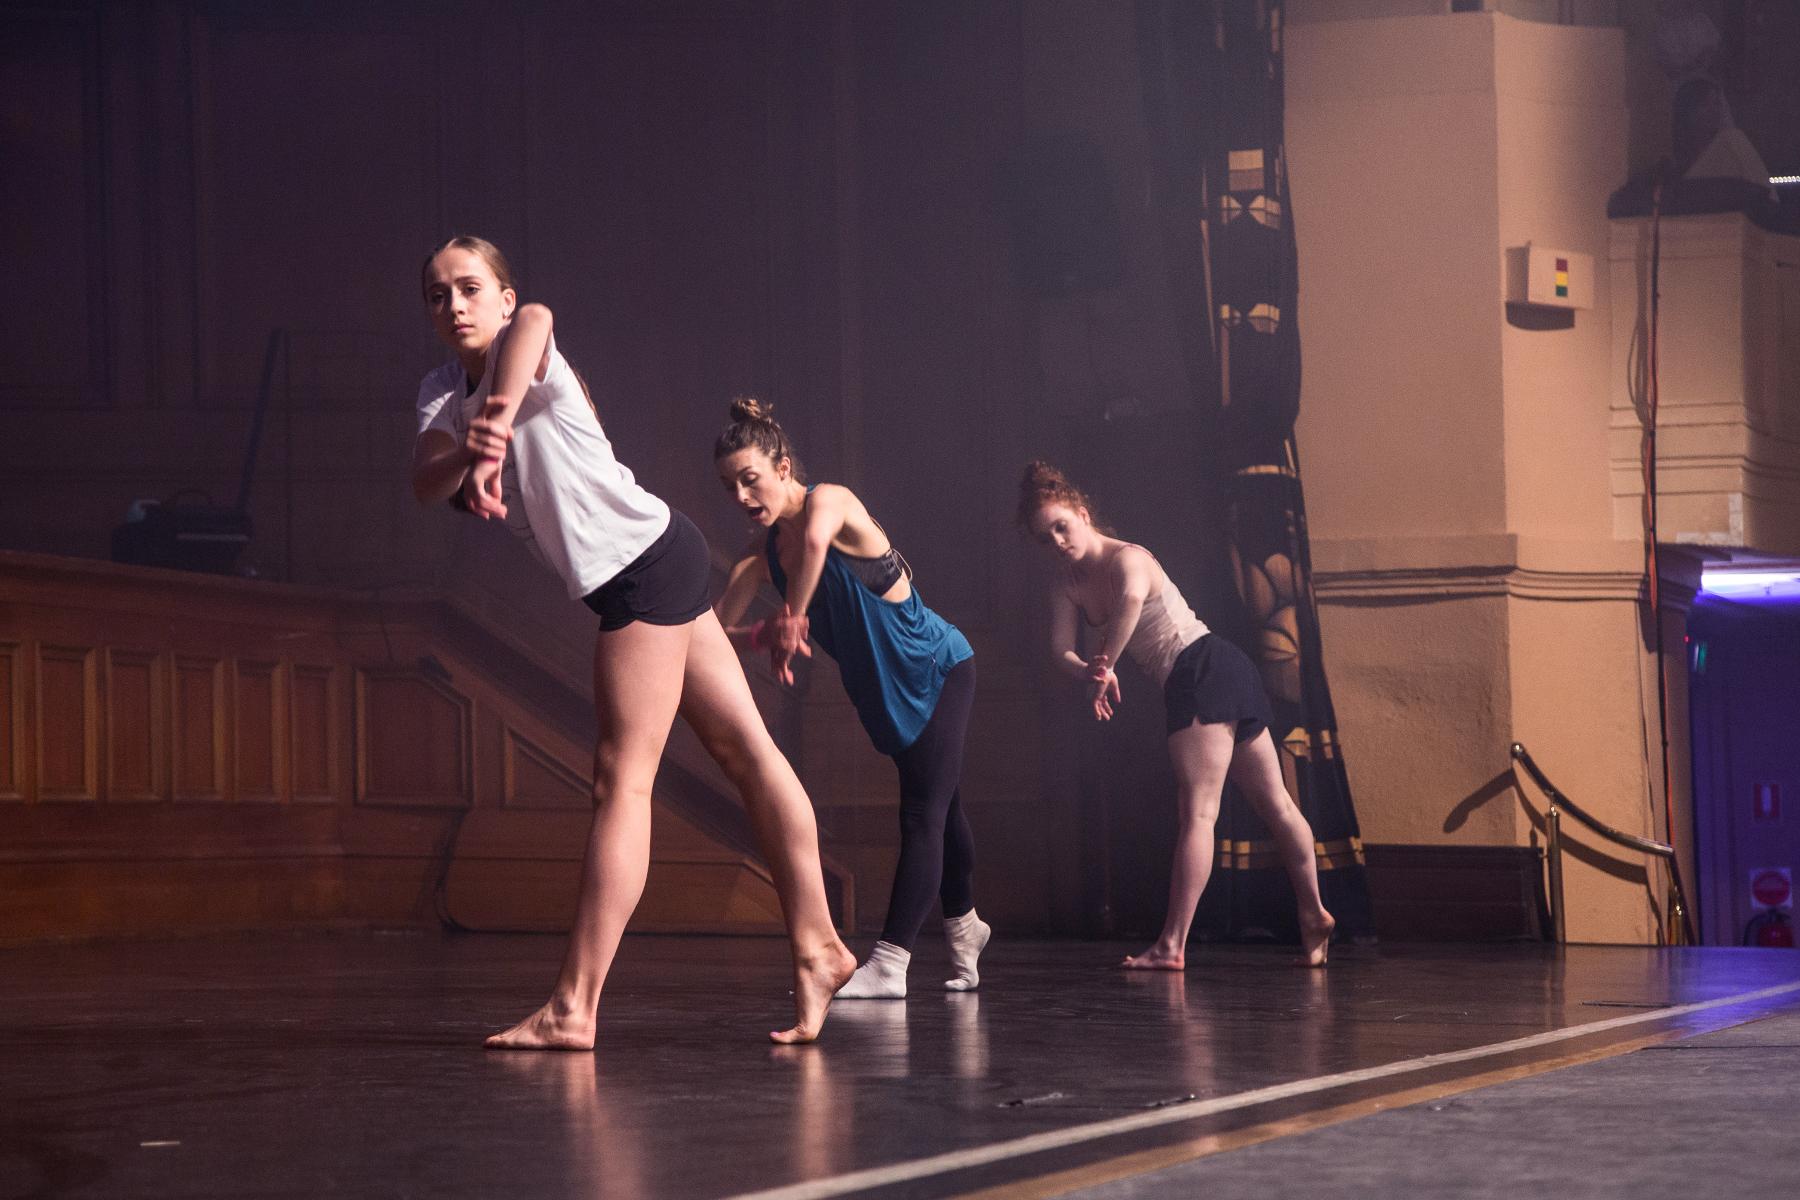 Tate McRae, Kathryn McCormick and Sarah Frangenberg teaching onstage at VDF 2017